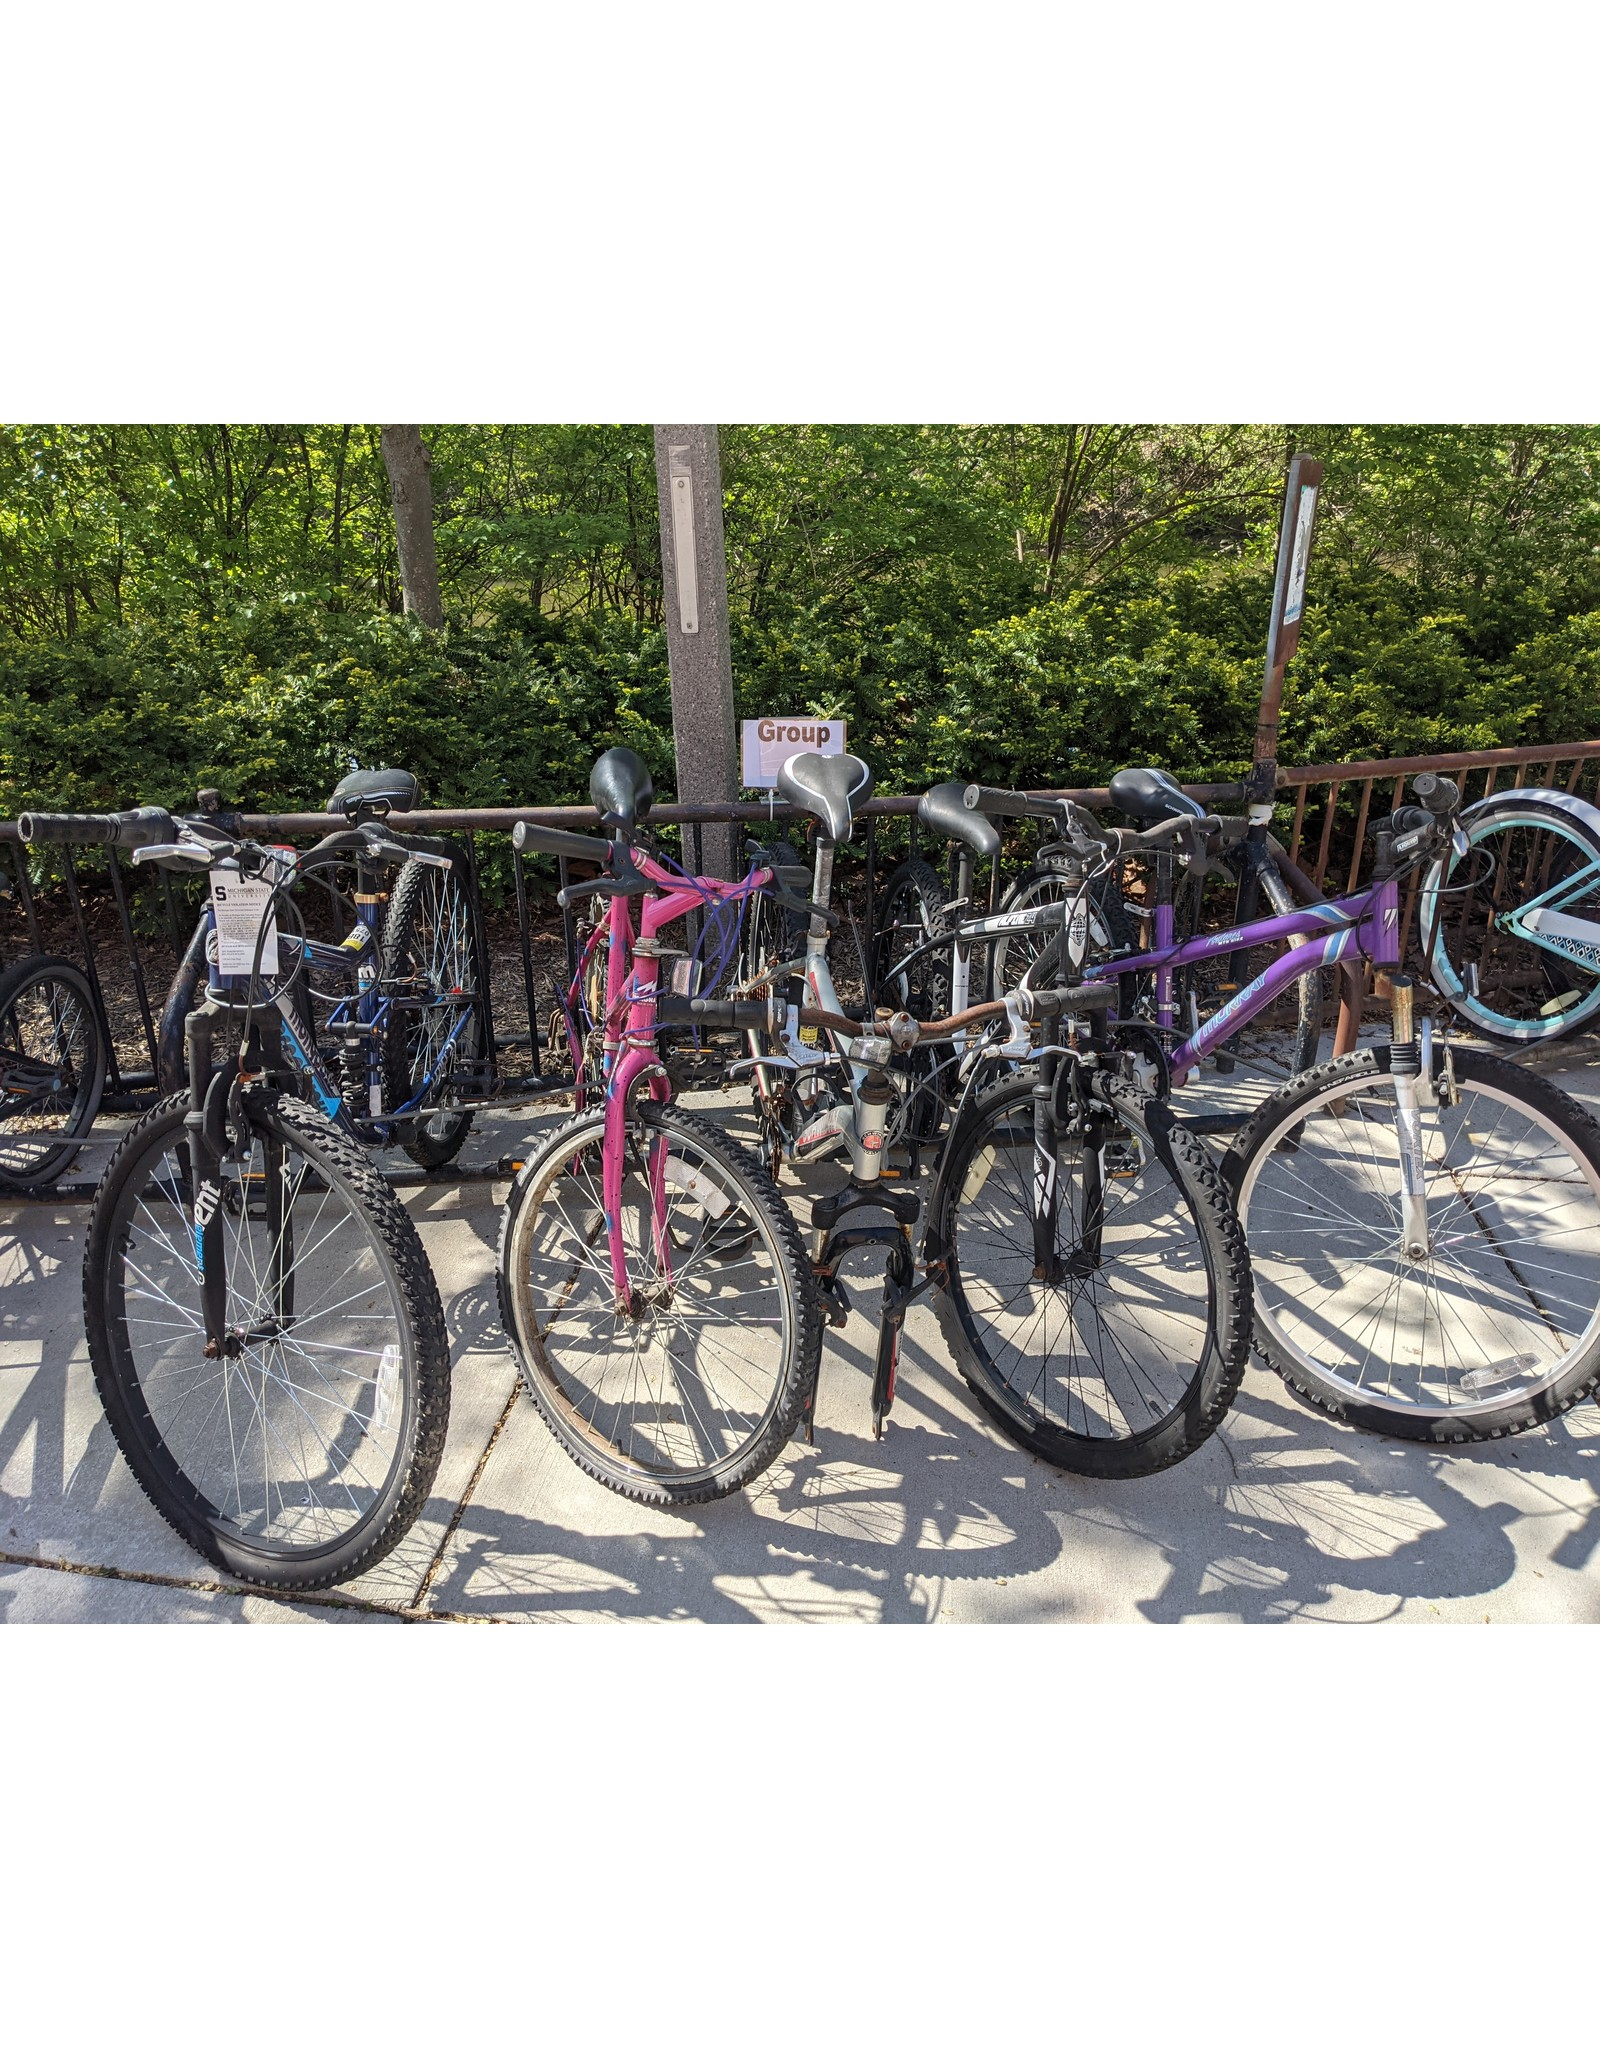 As-is Used bikes - Group 2